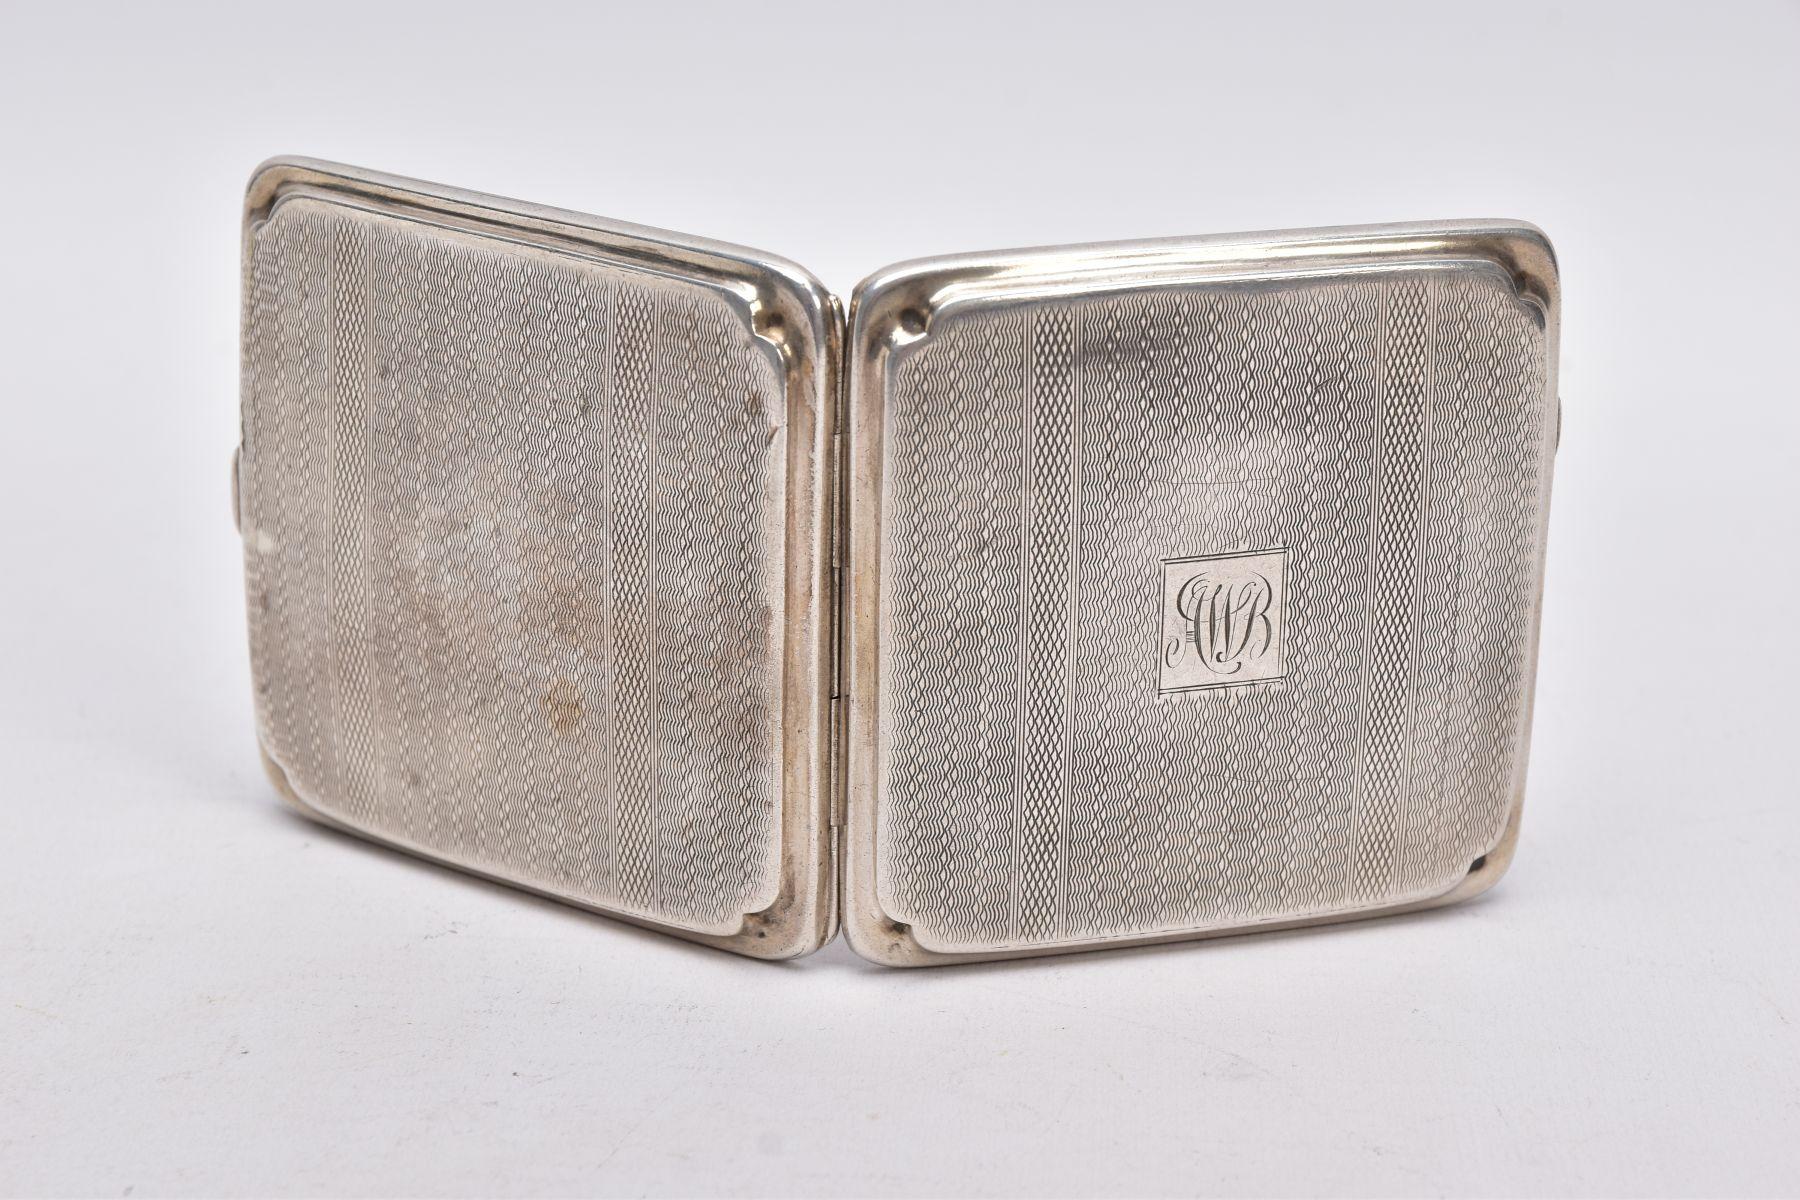 A SILVER CIGARETTE CASE, of an engine turn design, engraved monogram, missing elastic straps on